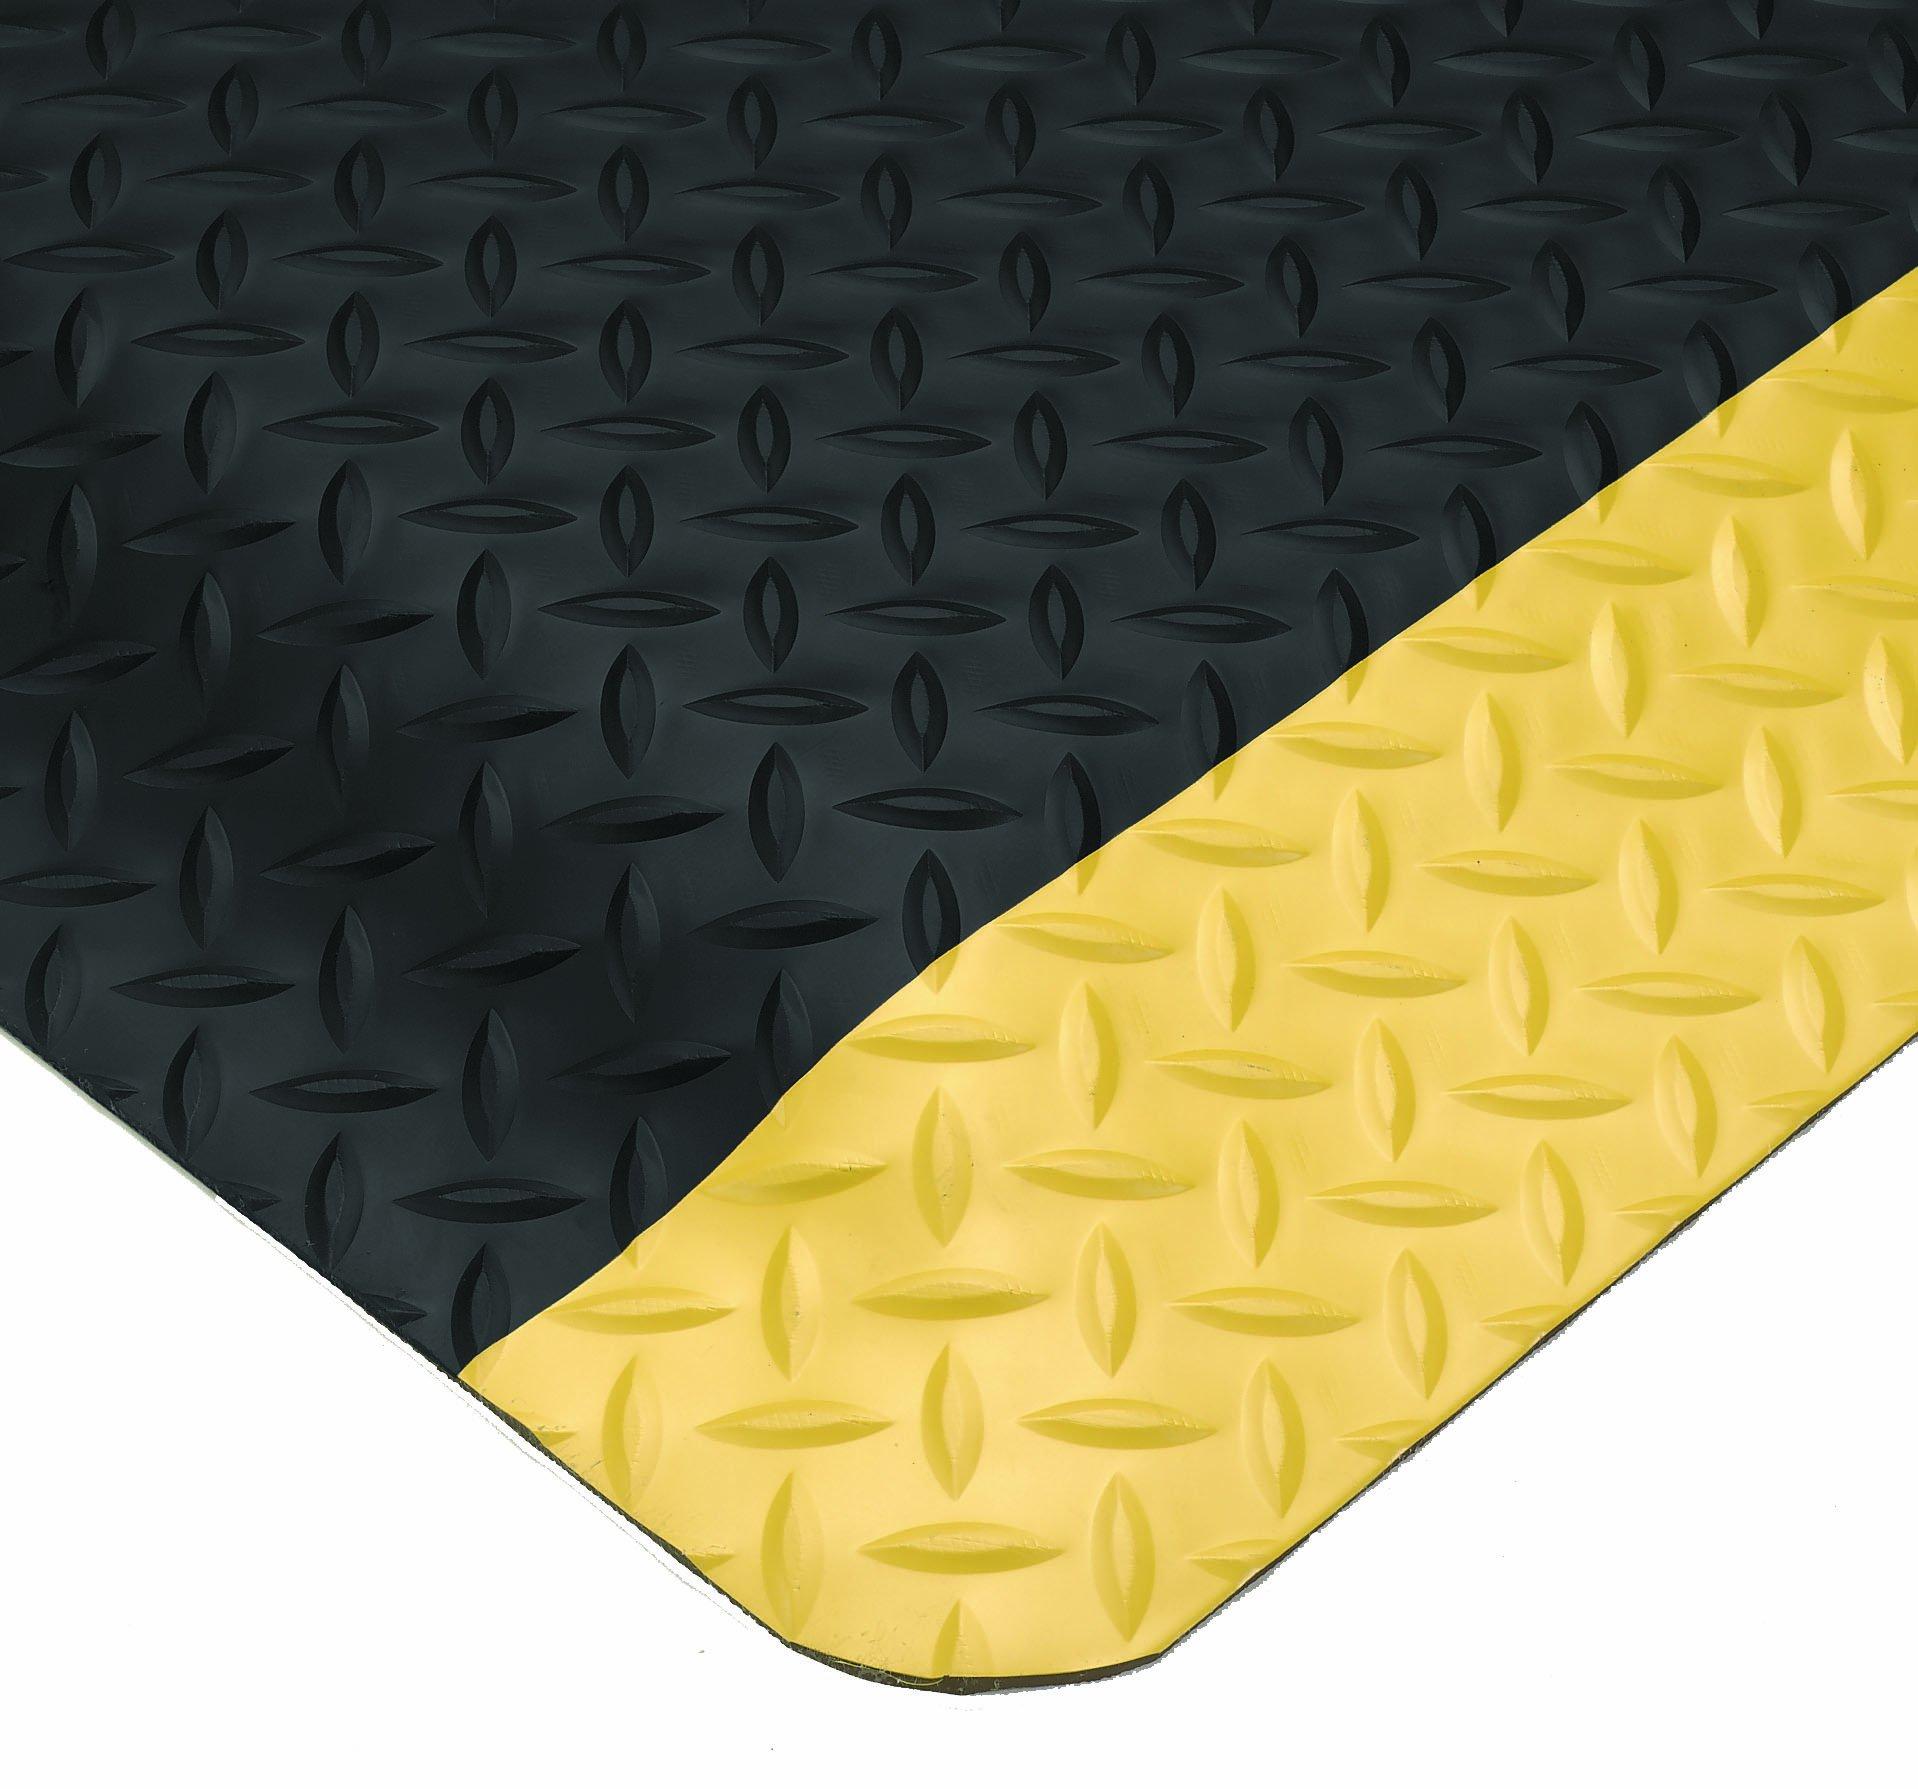 Wearwell 495.1516x2x3BYL Diamond-Plate Select UltraSoft Mat, 2' Width x 3' Length x 15/16'' Thick, Black/Yellow